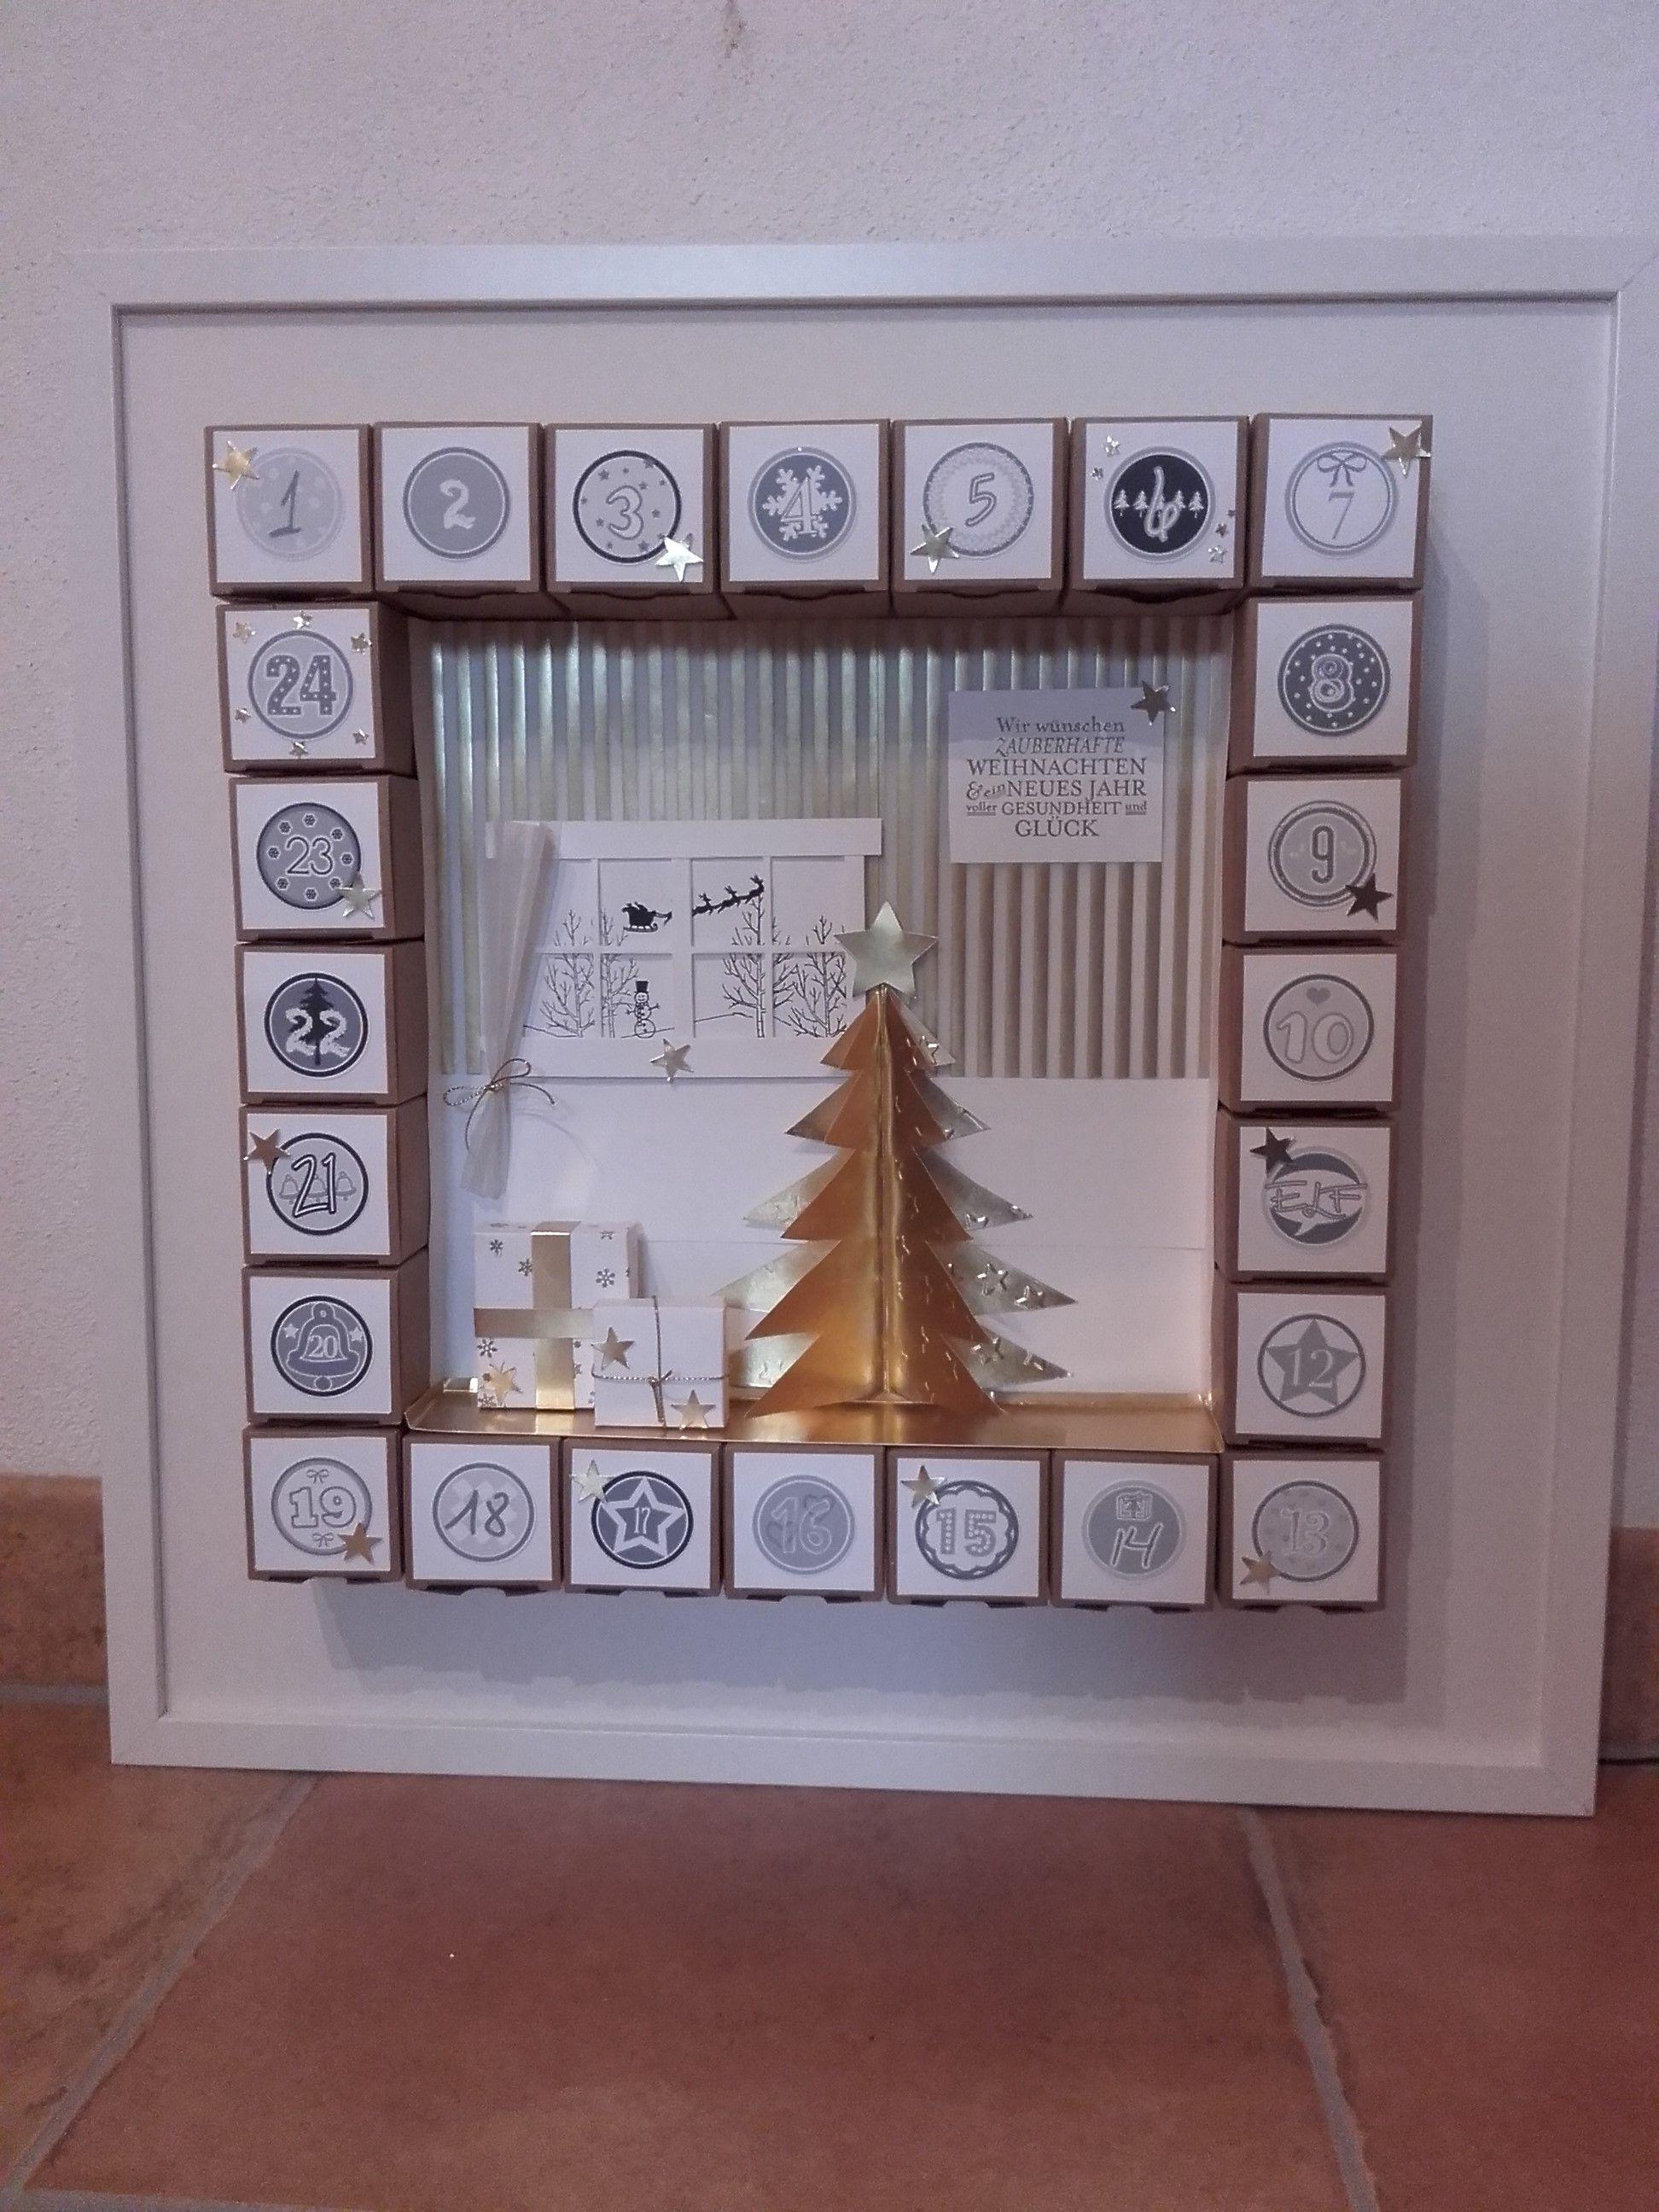 Adventskalender | Новый год | Pinterest | Ikea bilderrahmen, meine ...